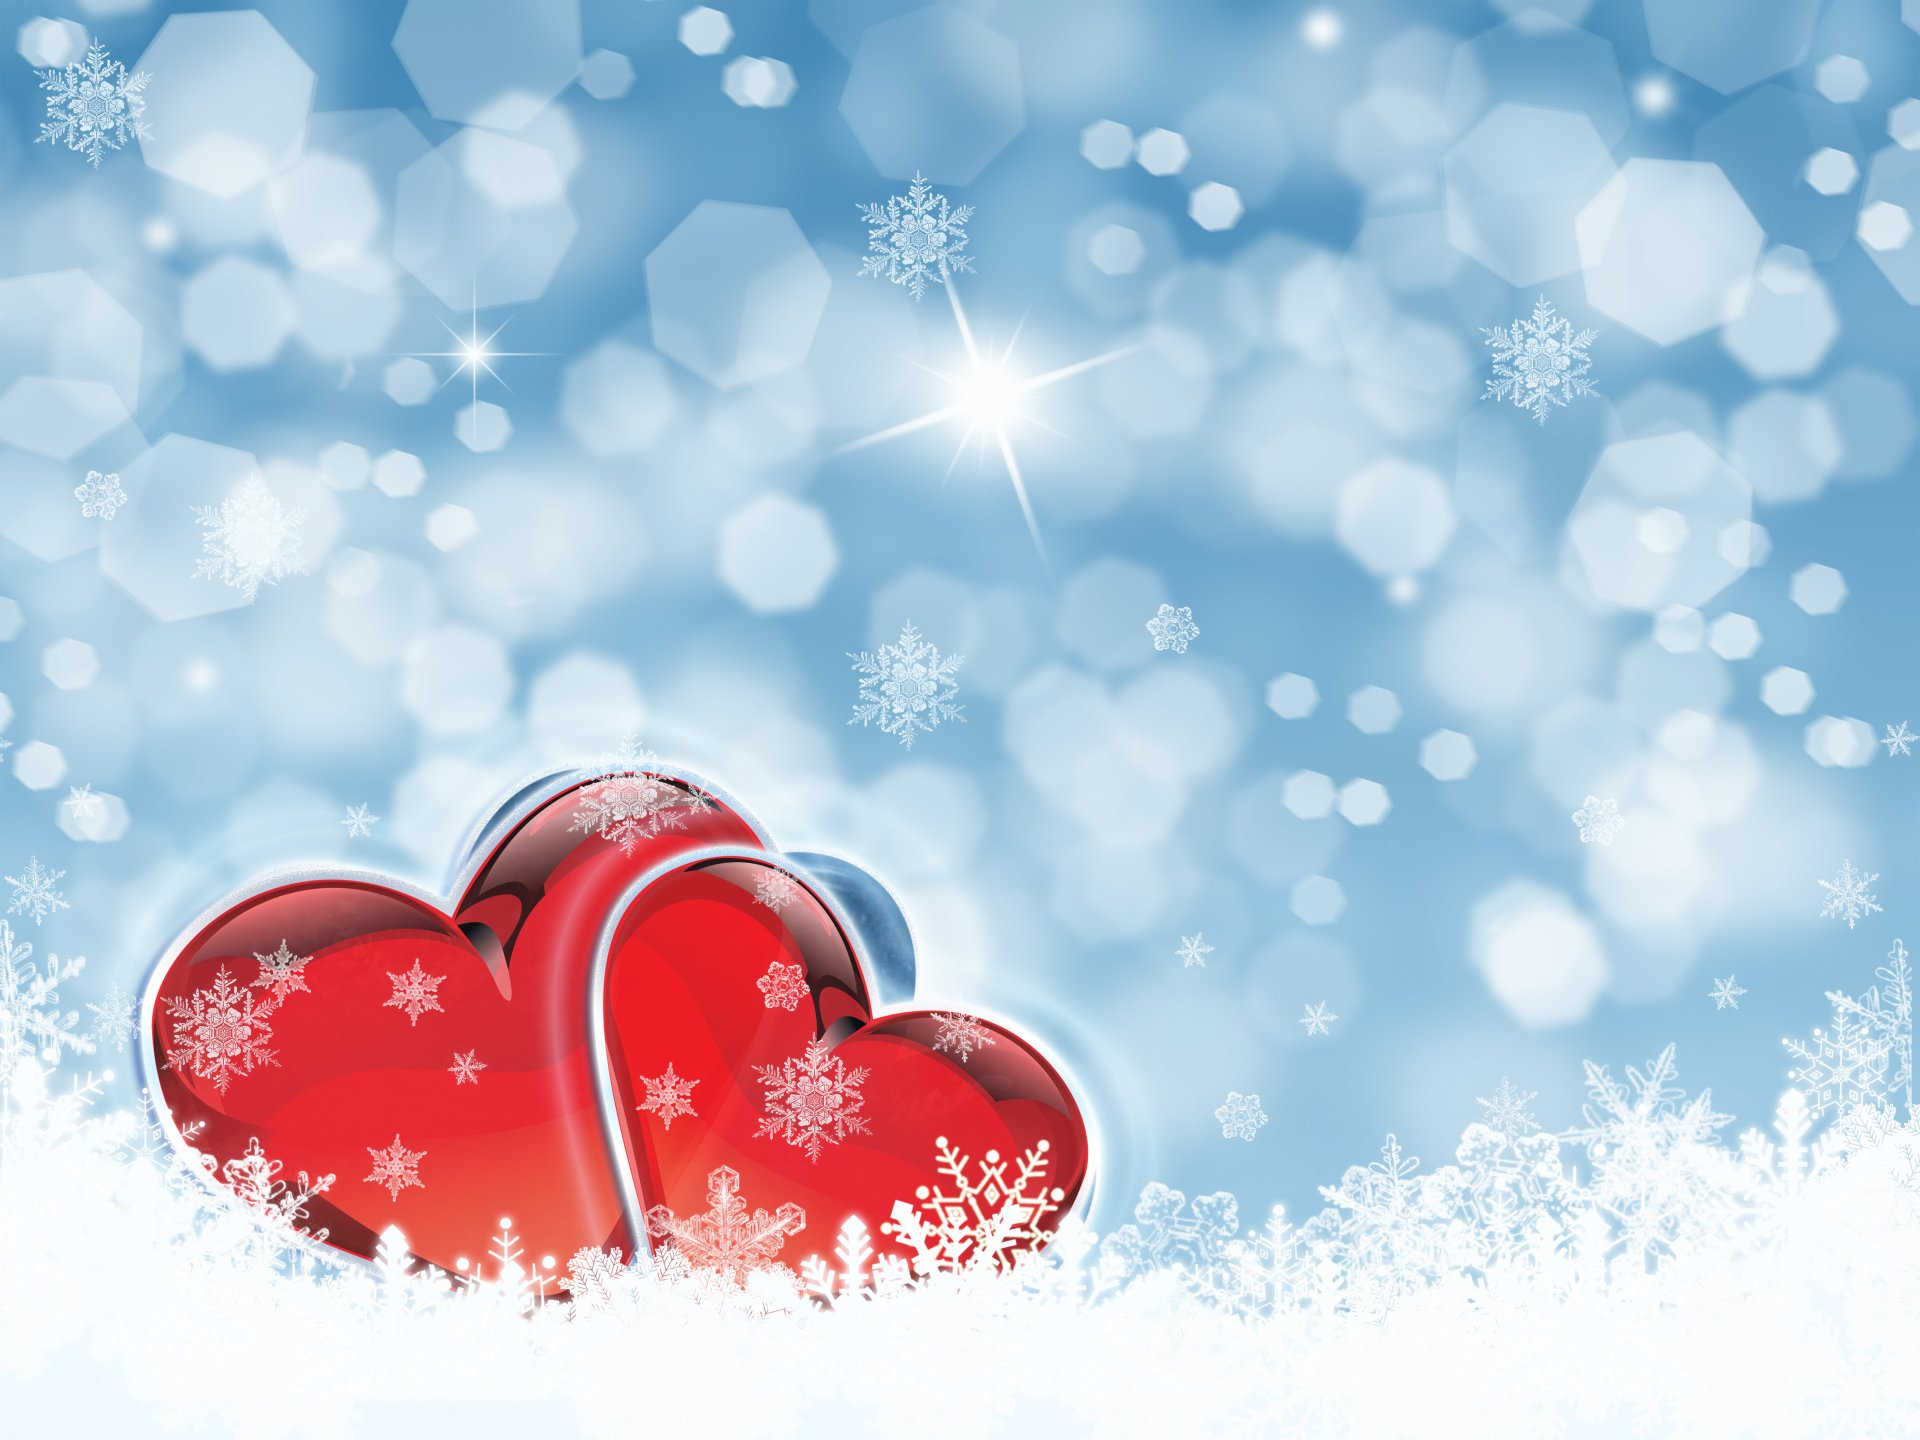 Artistic - Heart  Artistic Red Snow Snowflake Wallpaper